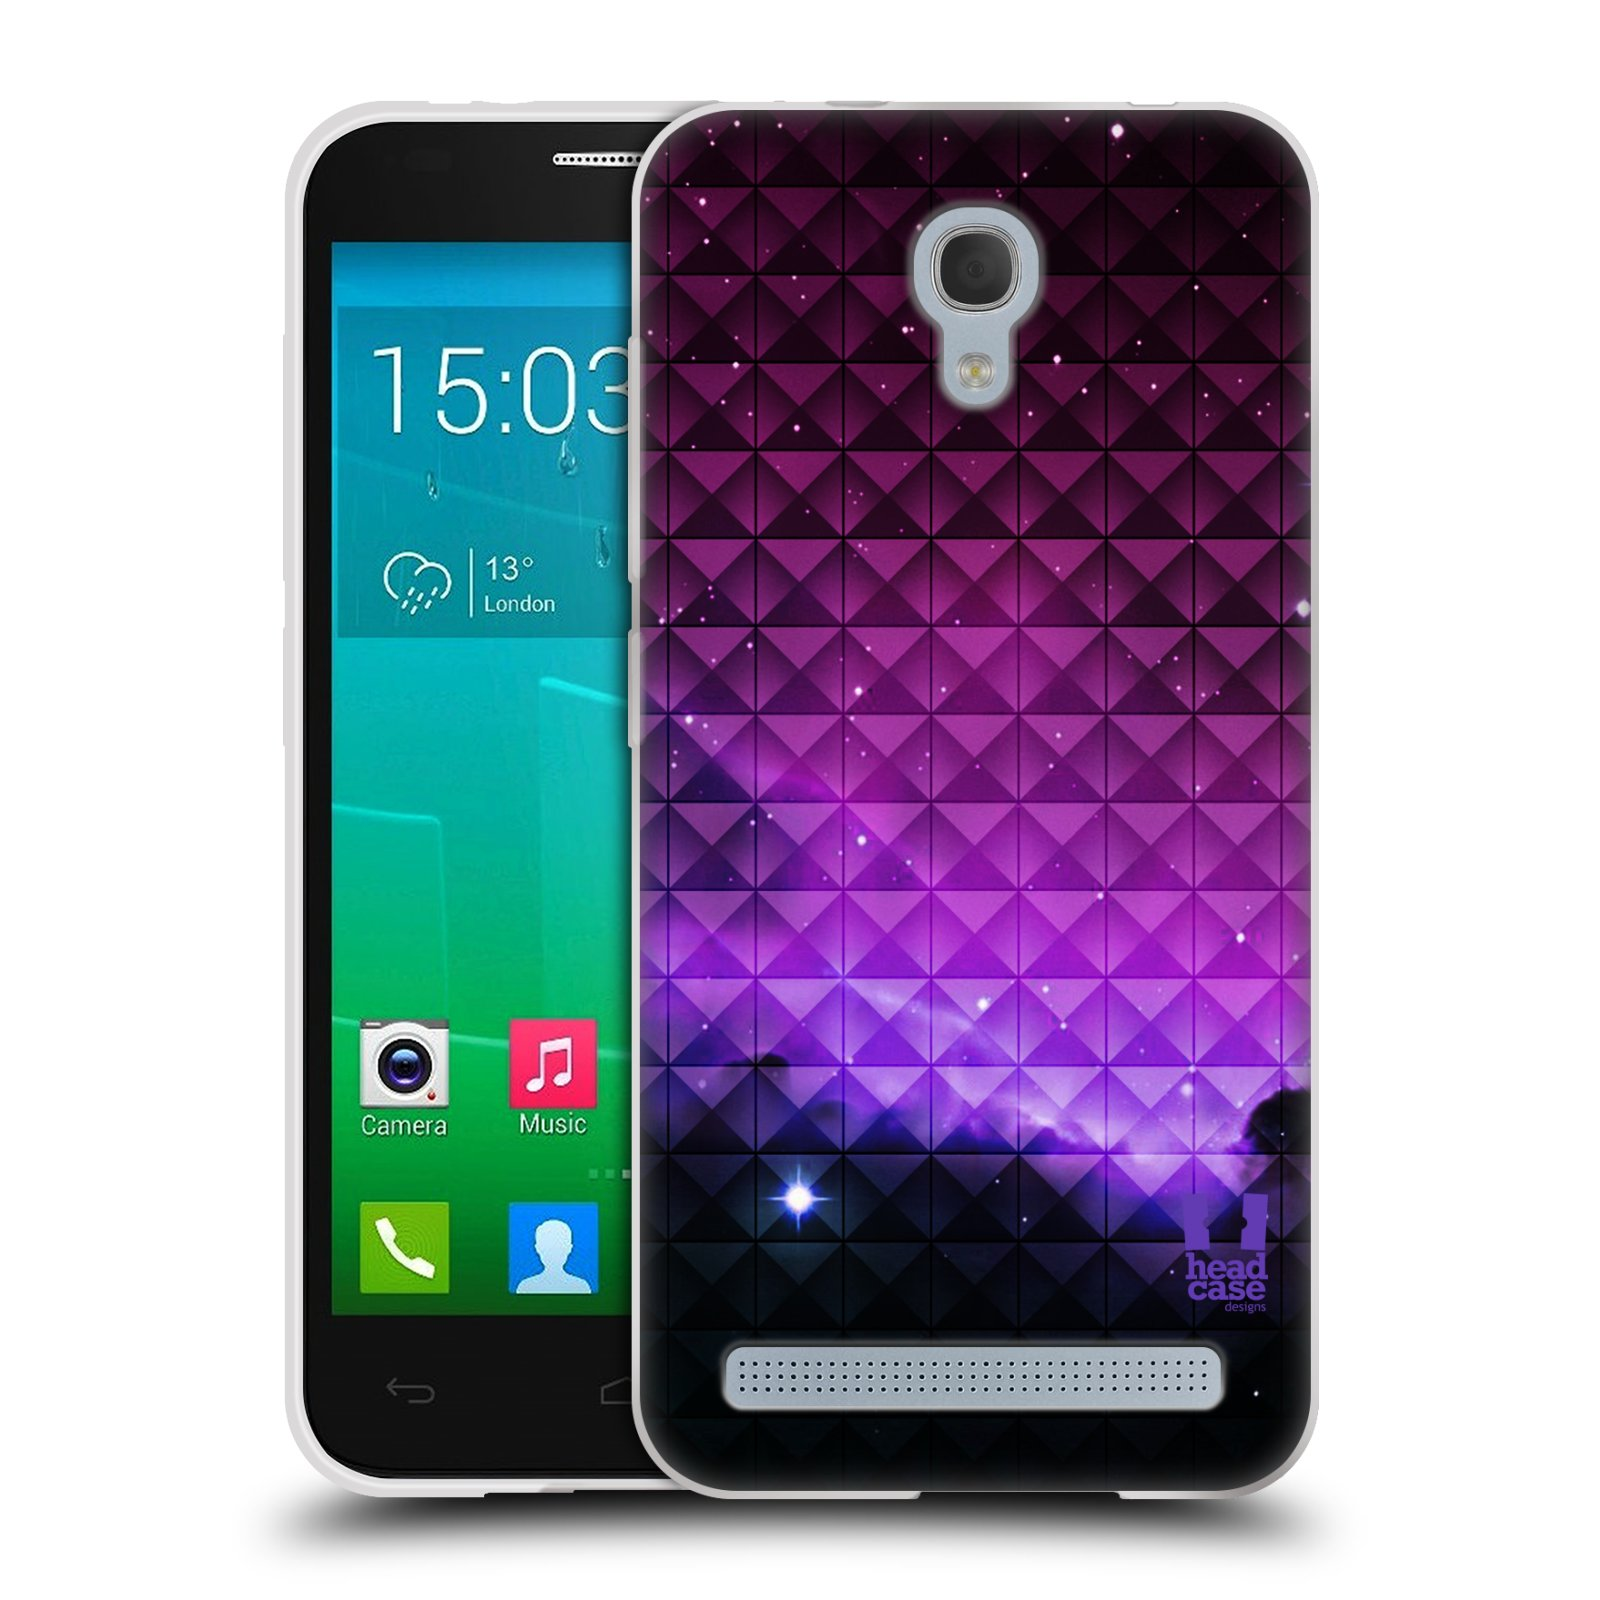 Silikonové pouzdro na mobil Alcatel One Touch Idol 2 Mini S 6036Y HEAD CASE PURPLE HAZE (Silikonový kryt či obal na mobilní telefon Alcatel Idol 2 Mini S OT-6036Y)